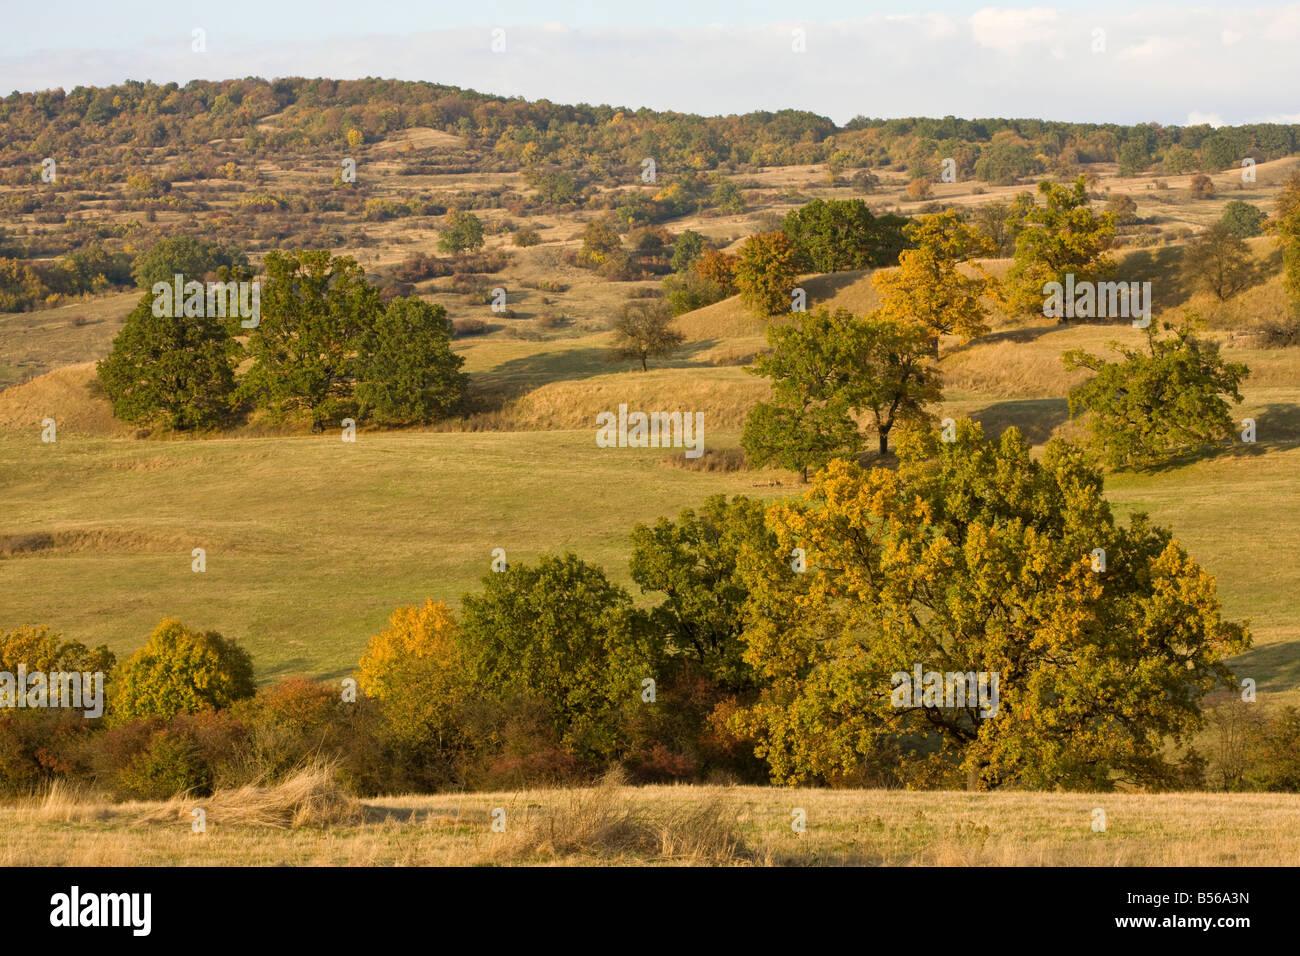 Pastoral countryside near Bunest in saxon villages area Transylvania Romania - Stock Image